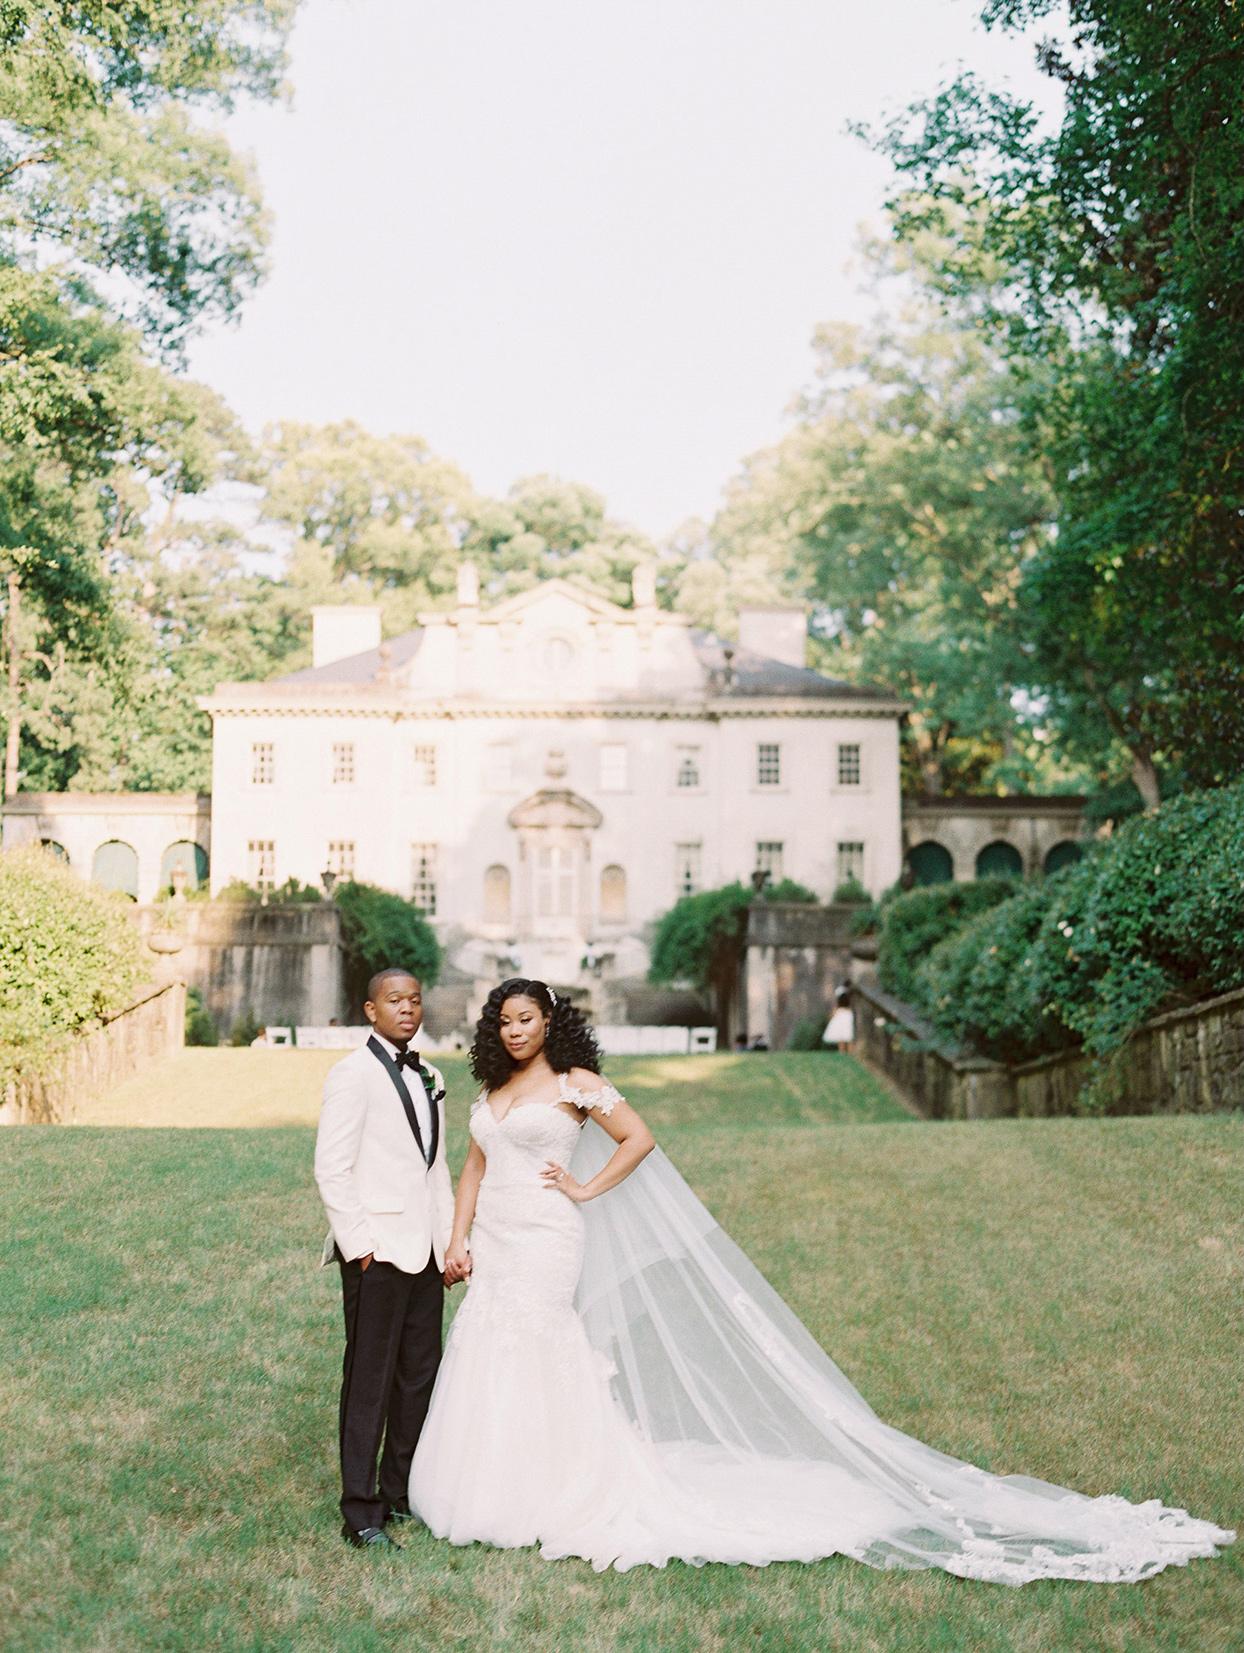 amelia justin wedding bride and groom long veil